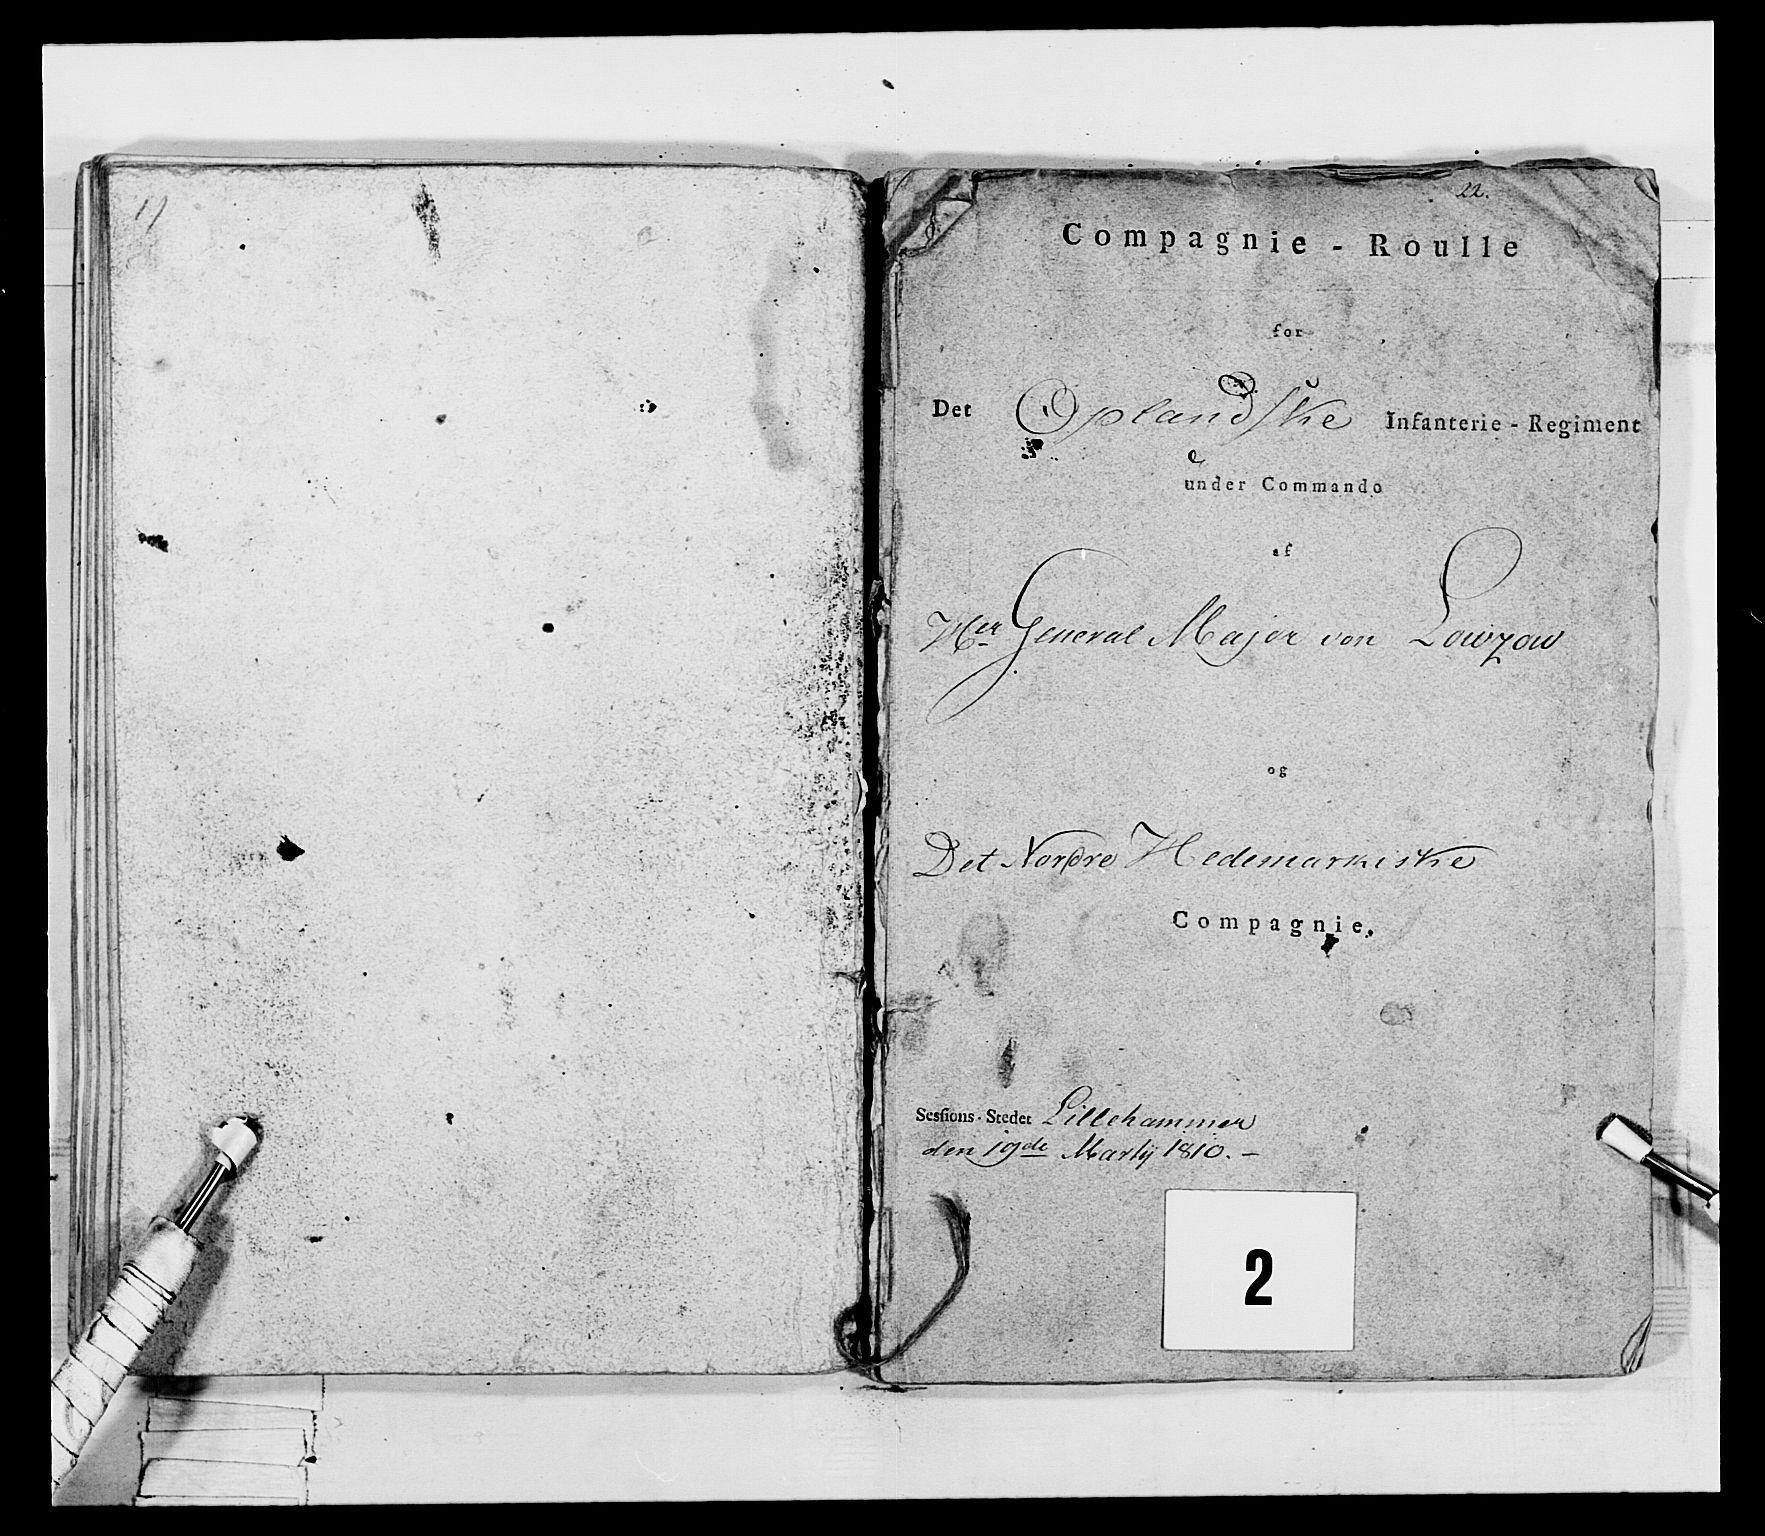 RA, Generalitets- og kommissariatskollegiet, Det kongelige norske kommissariatskollegium, E/Eh/L0069: Opplandske gevorbne infanteriregiment, 1810-1818, s. 62